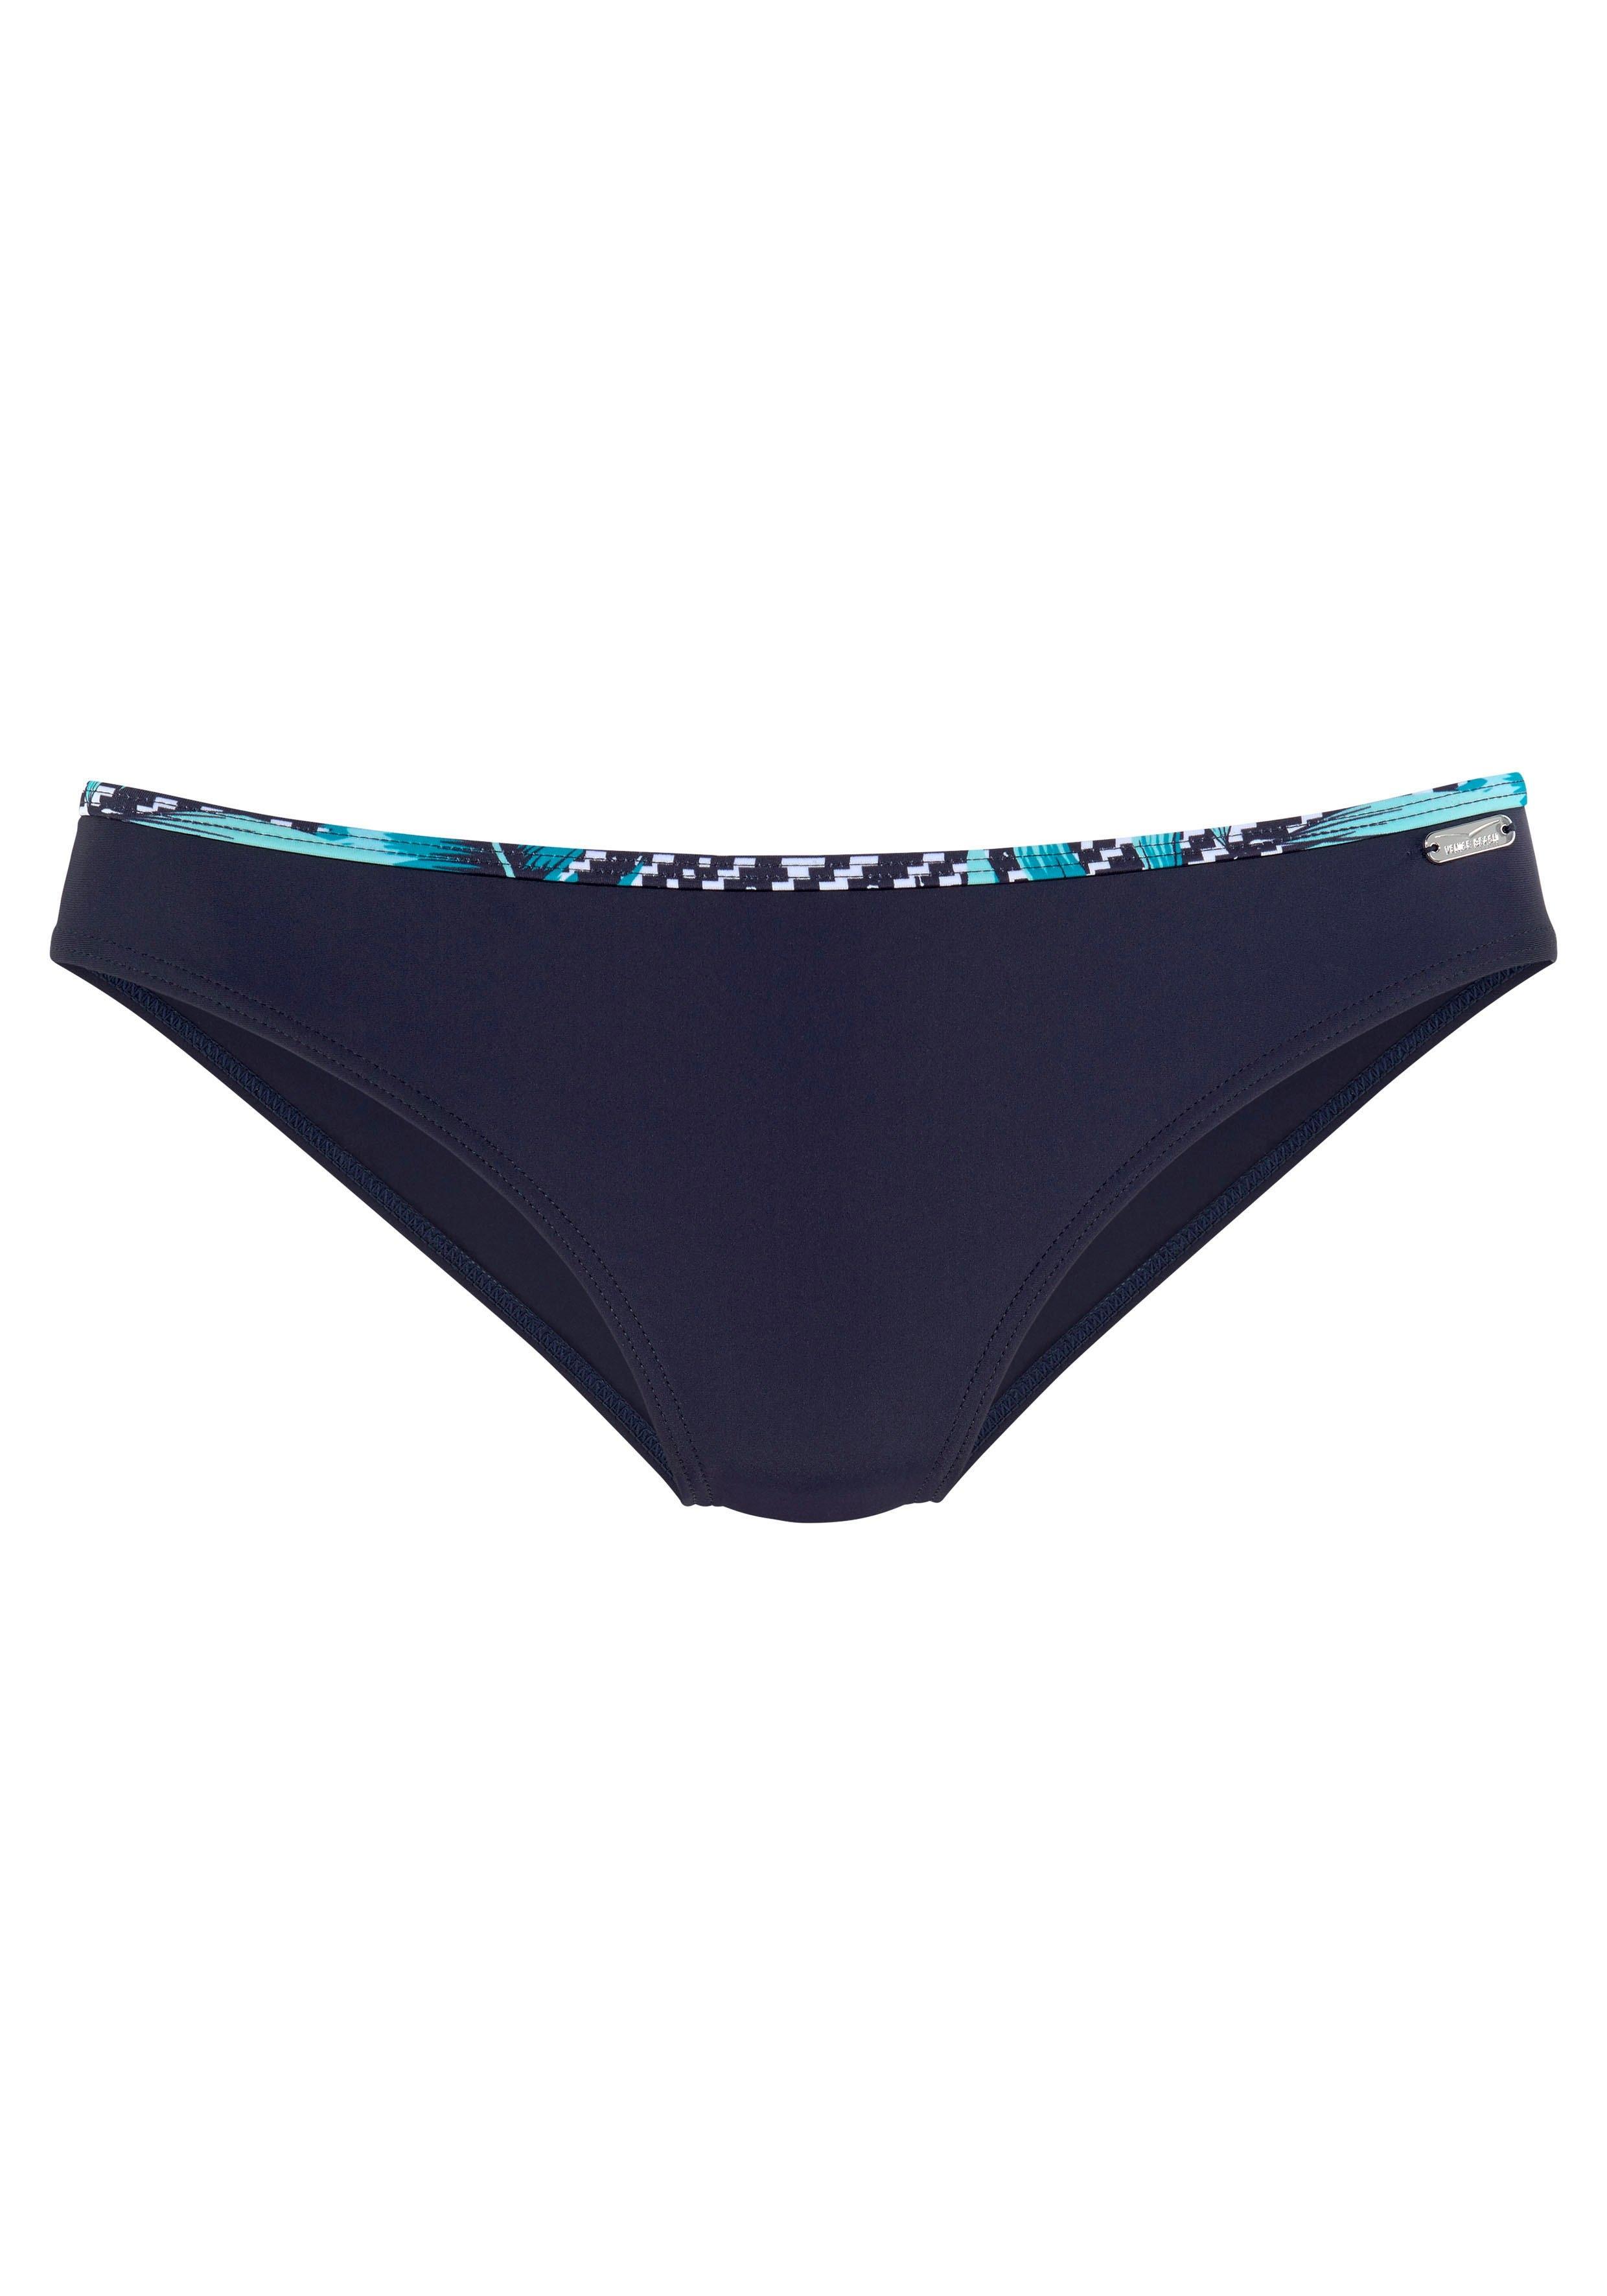 VENICE BEACH bikinibroekje »Jane« - verschillende betaalmethodes